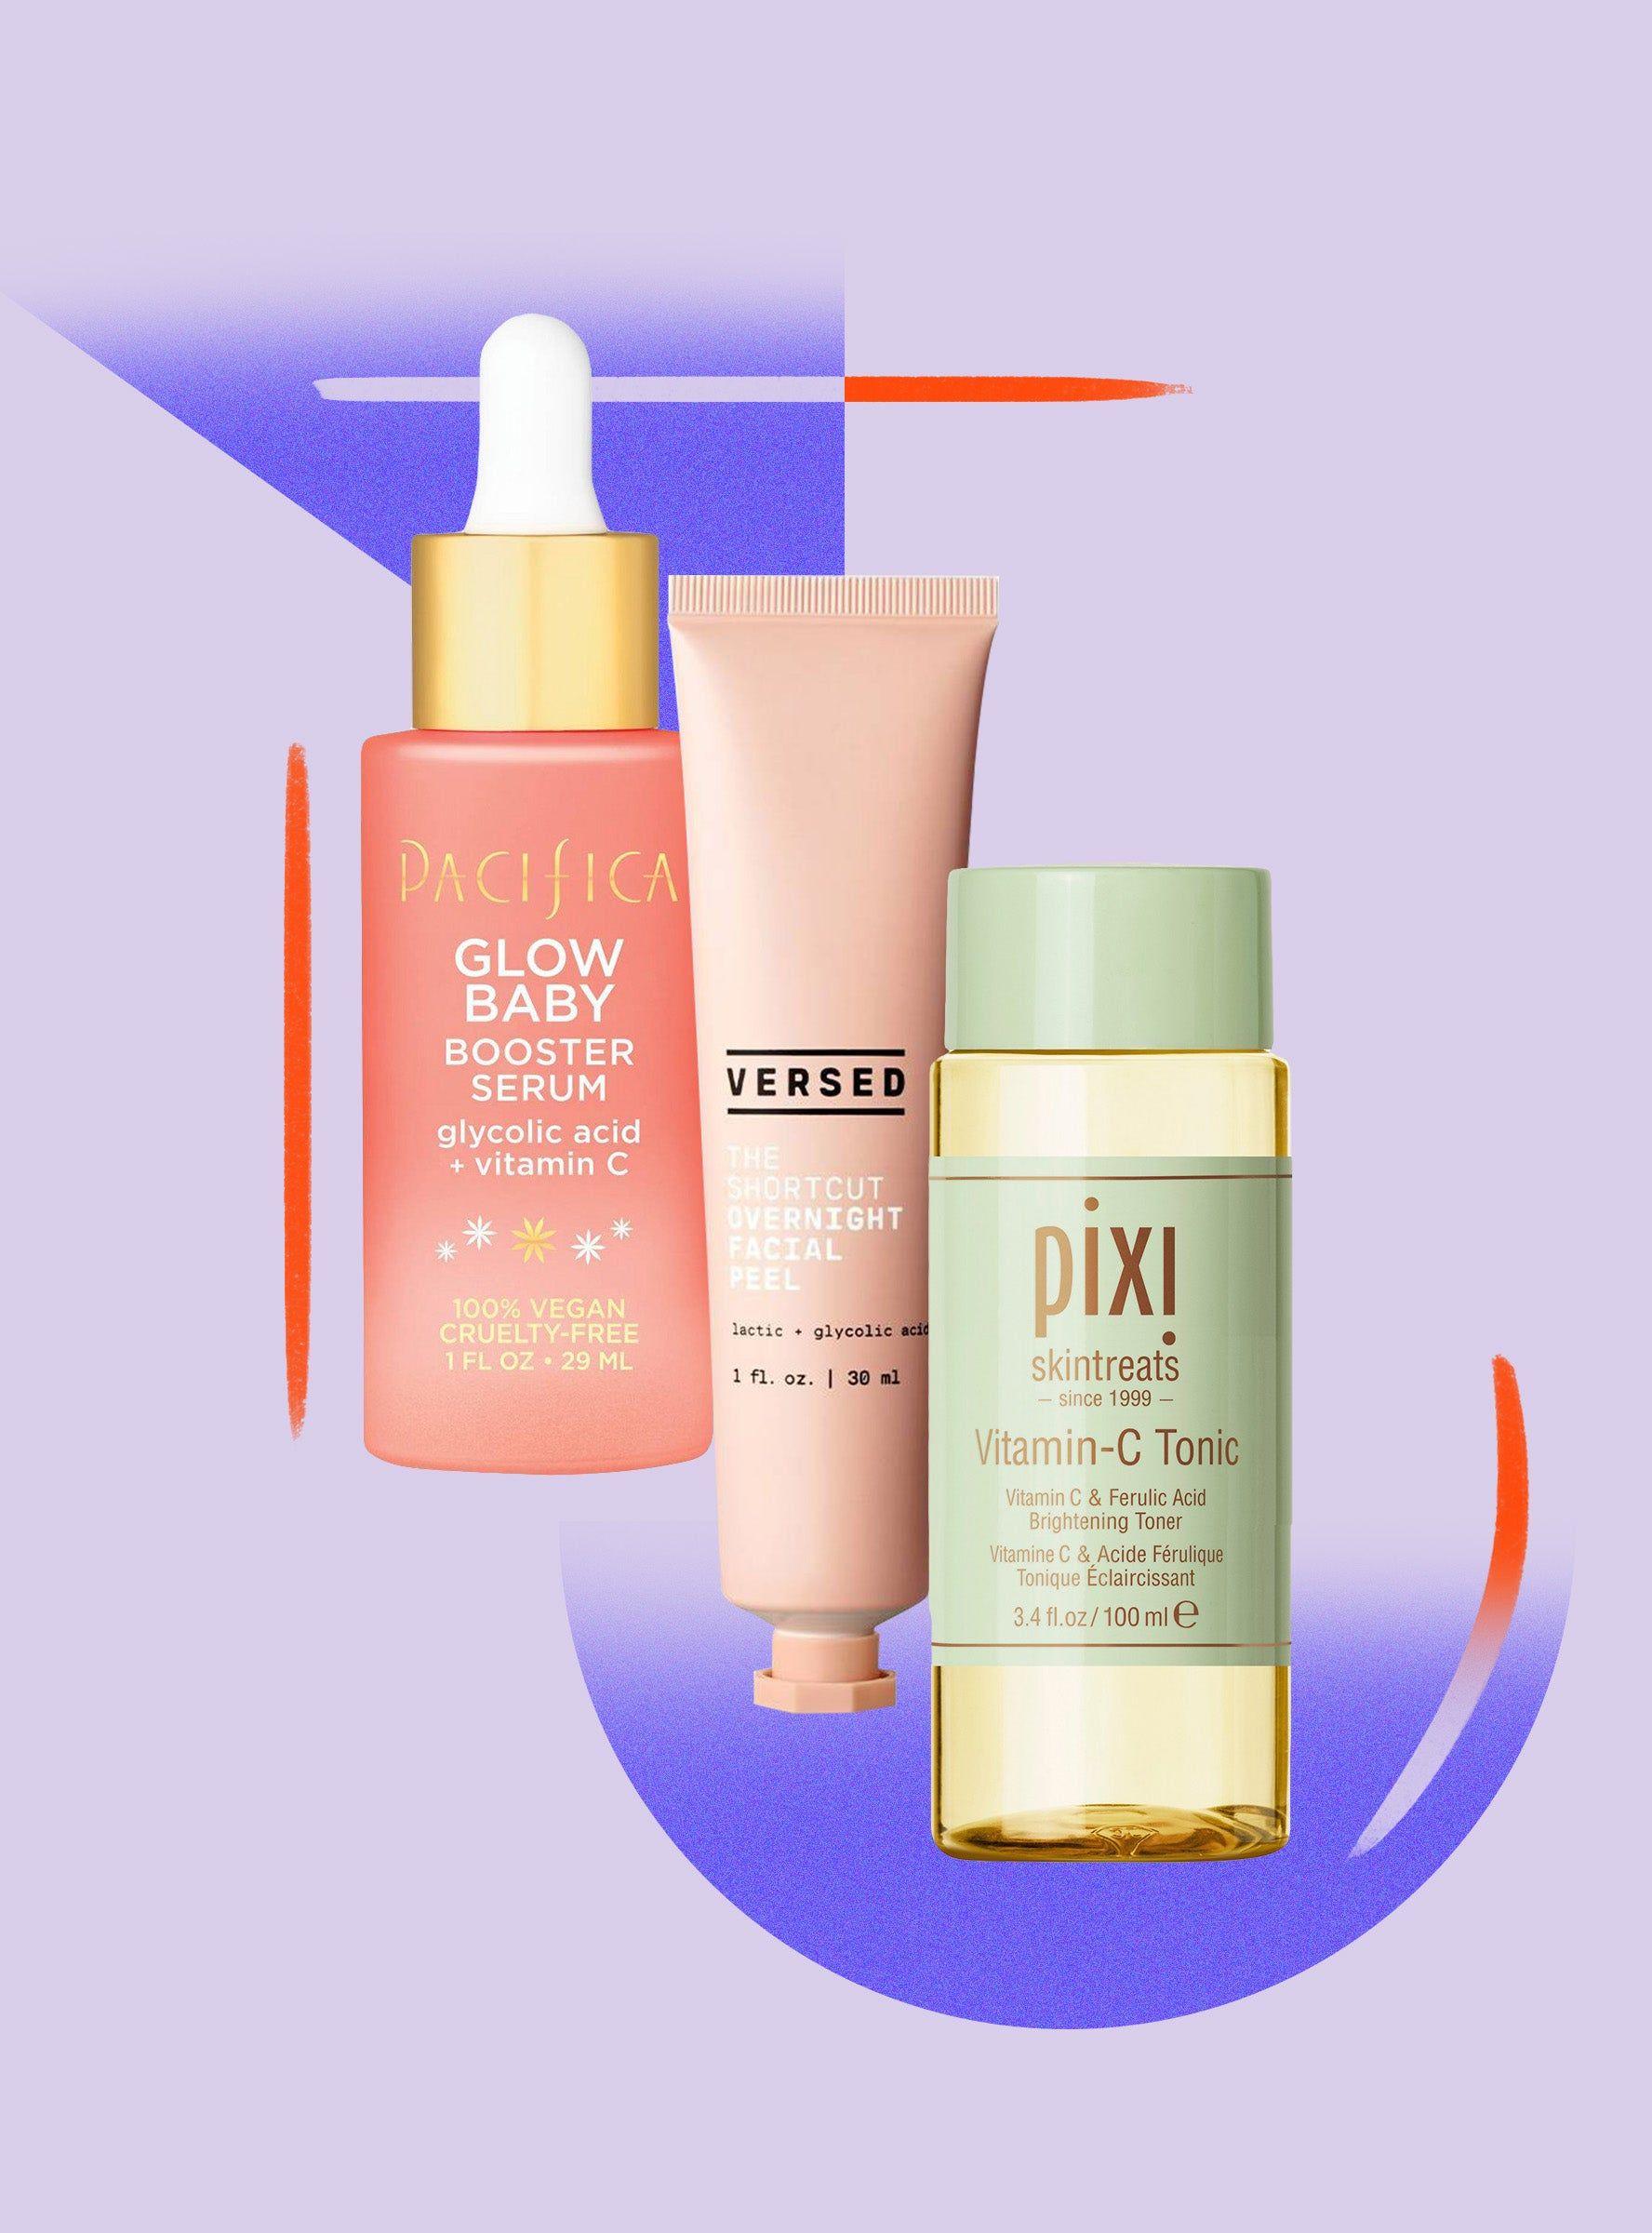 Makeup melt drywet gentle jelly cleanser target skin